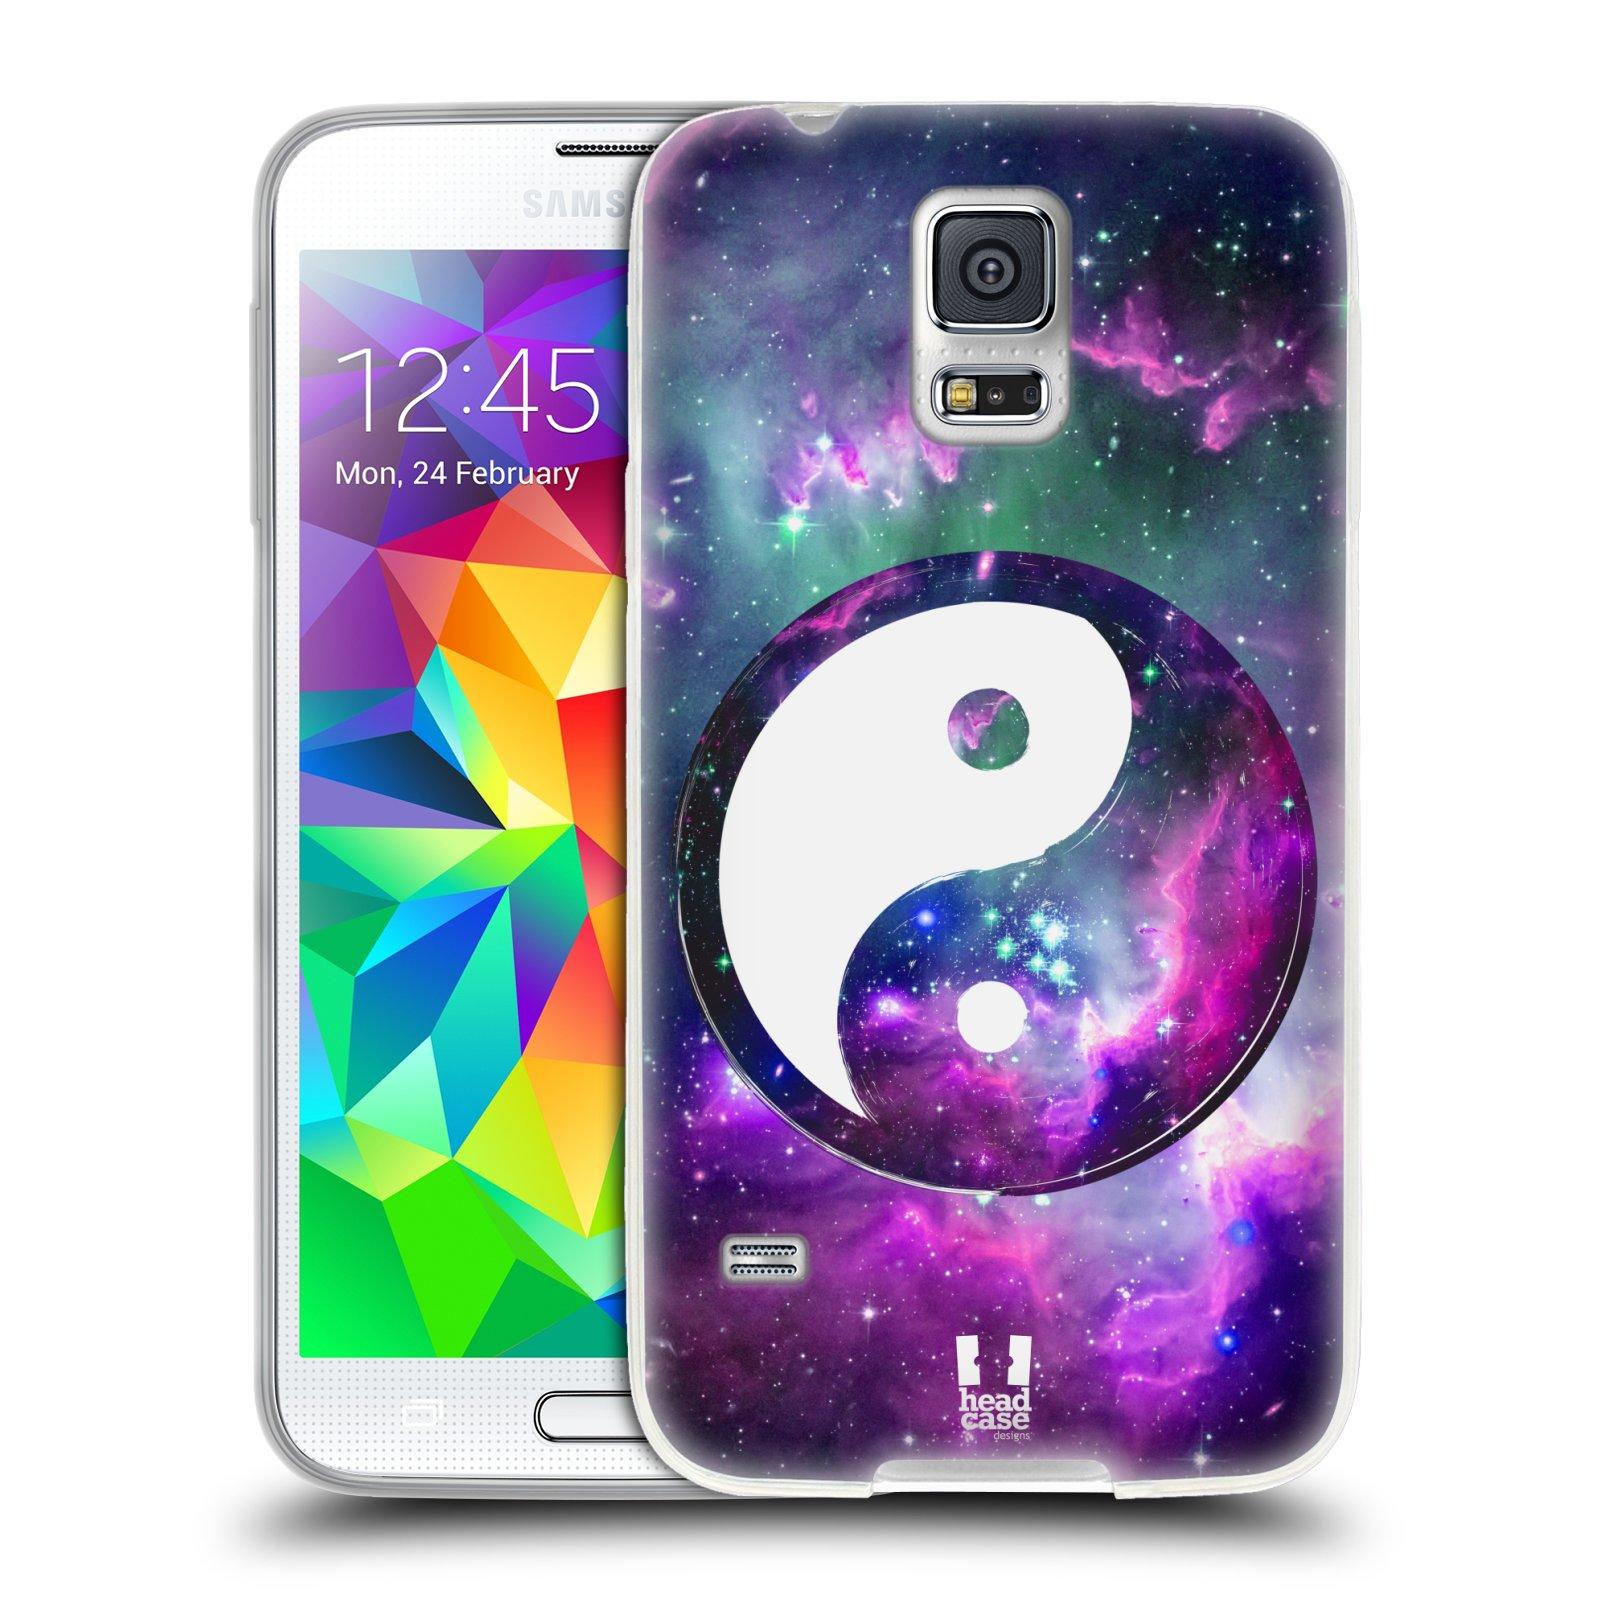 Silikonové pouzdro na mobil Samsung Galaxy S5 HEAD CASE YIn a Yang PURPLE (Silikonový kryt či obal na mobilní telefon Samsung Galaxy S5 SM-G900F)